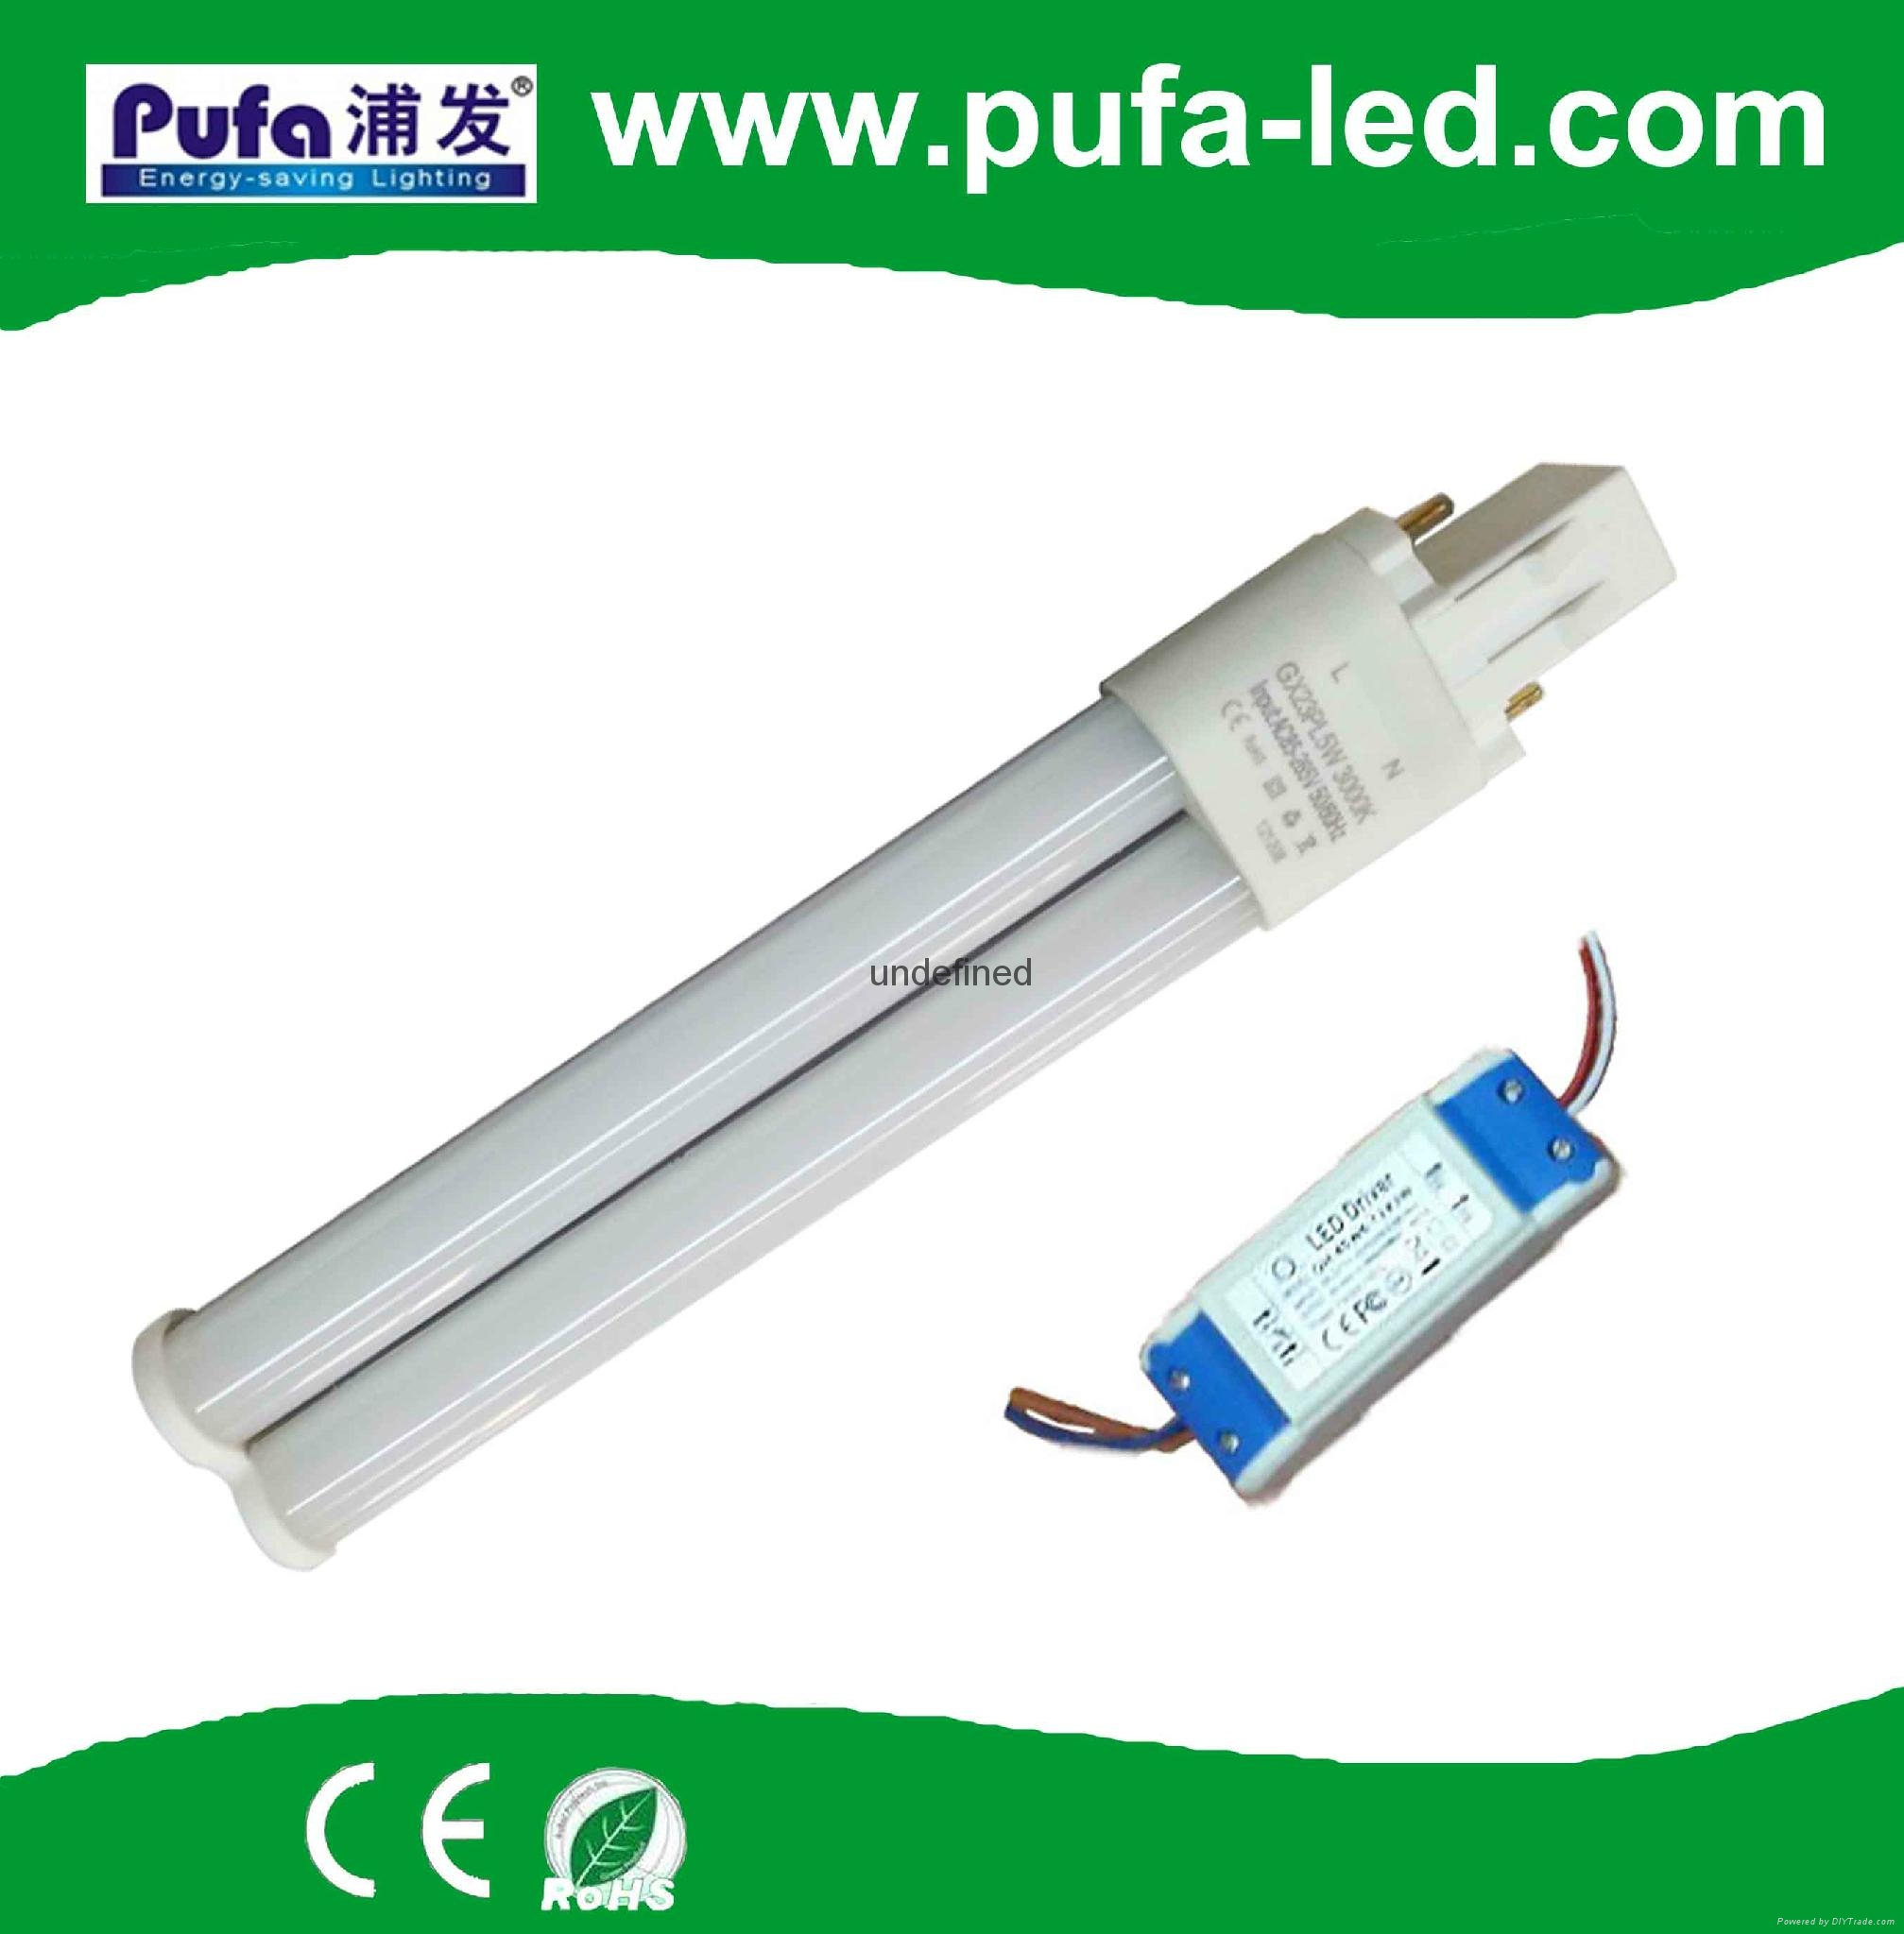 GX23 LED 横插灯 5W 外置电源 1